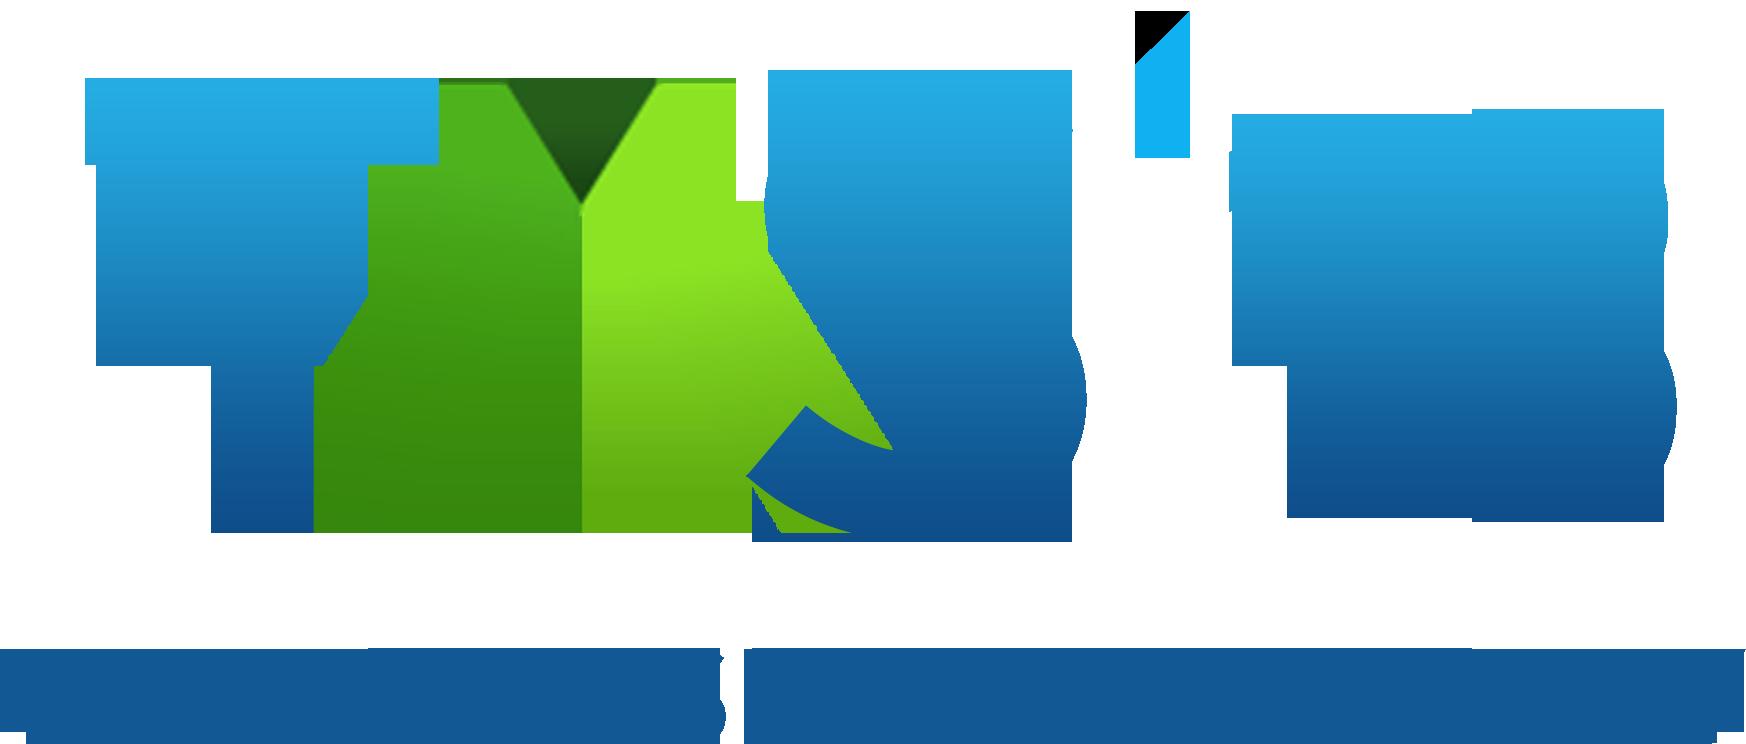 Talent Assessment Study 2018 - Mettl Research